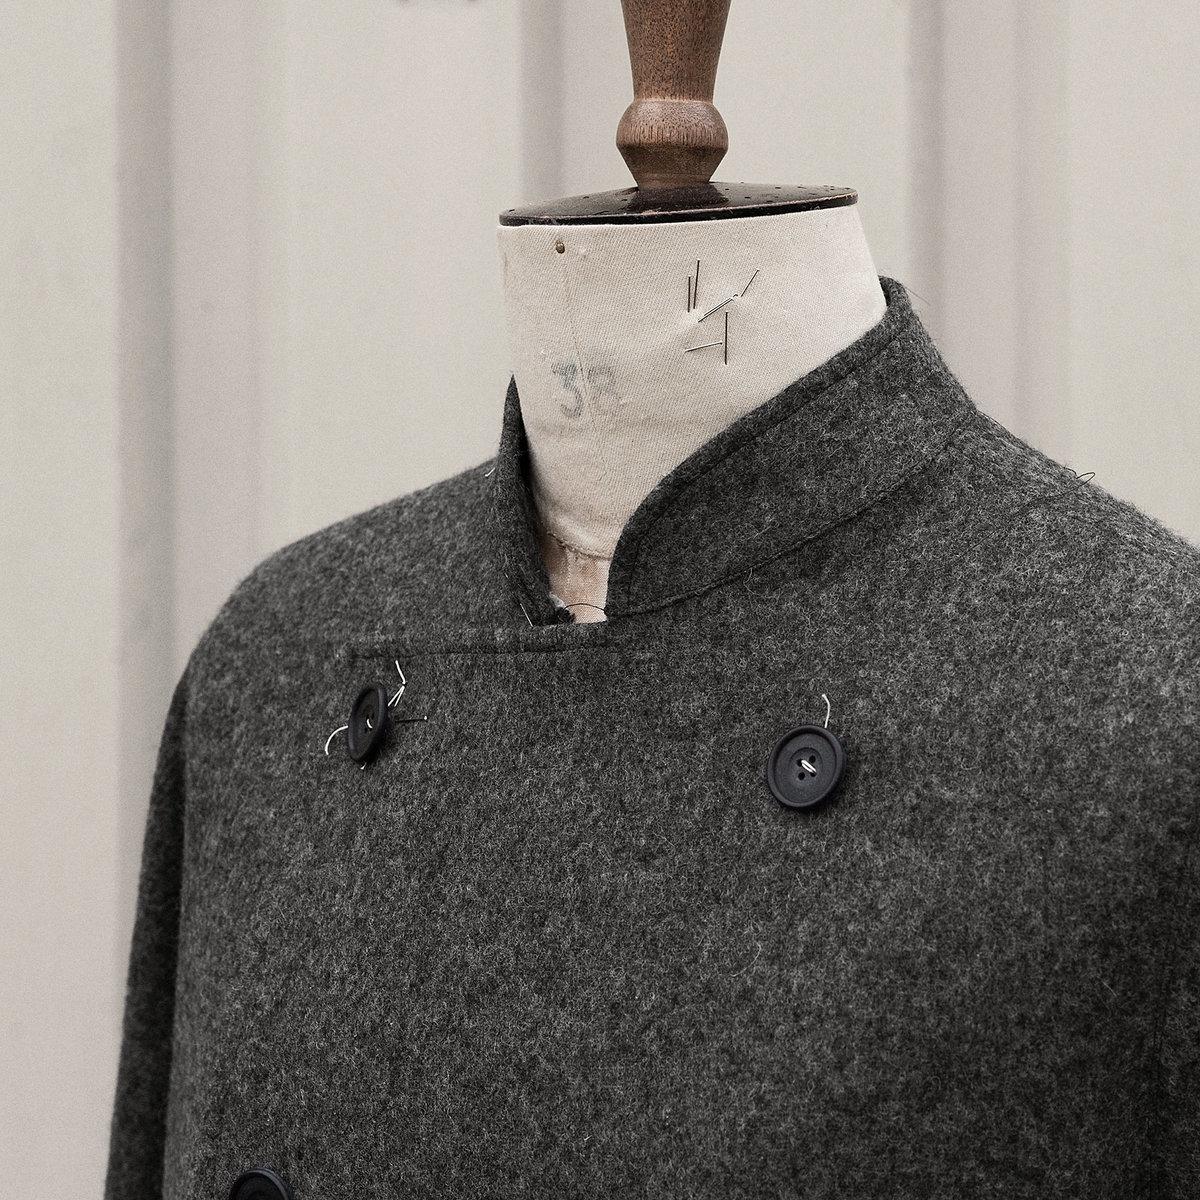 cooks-jacket-toile-1@2x copy.jpg